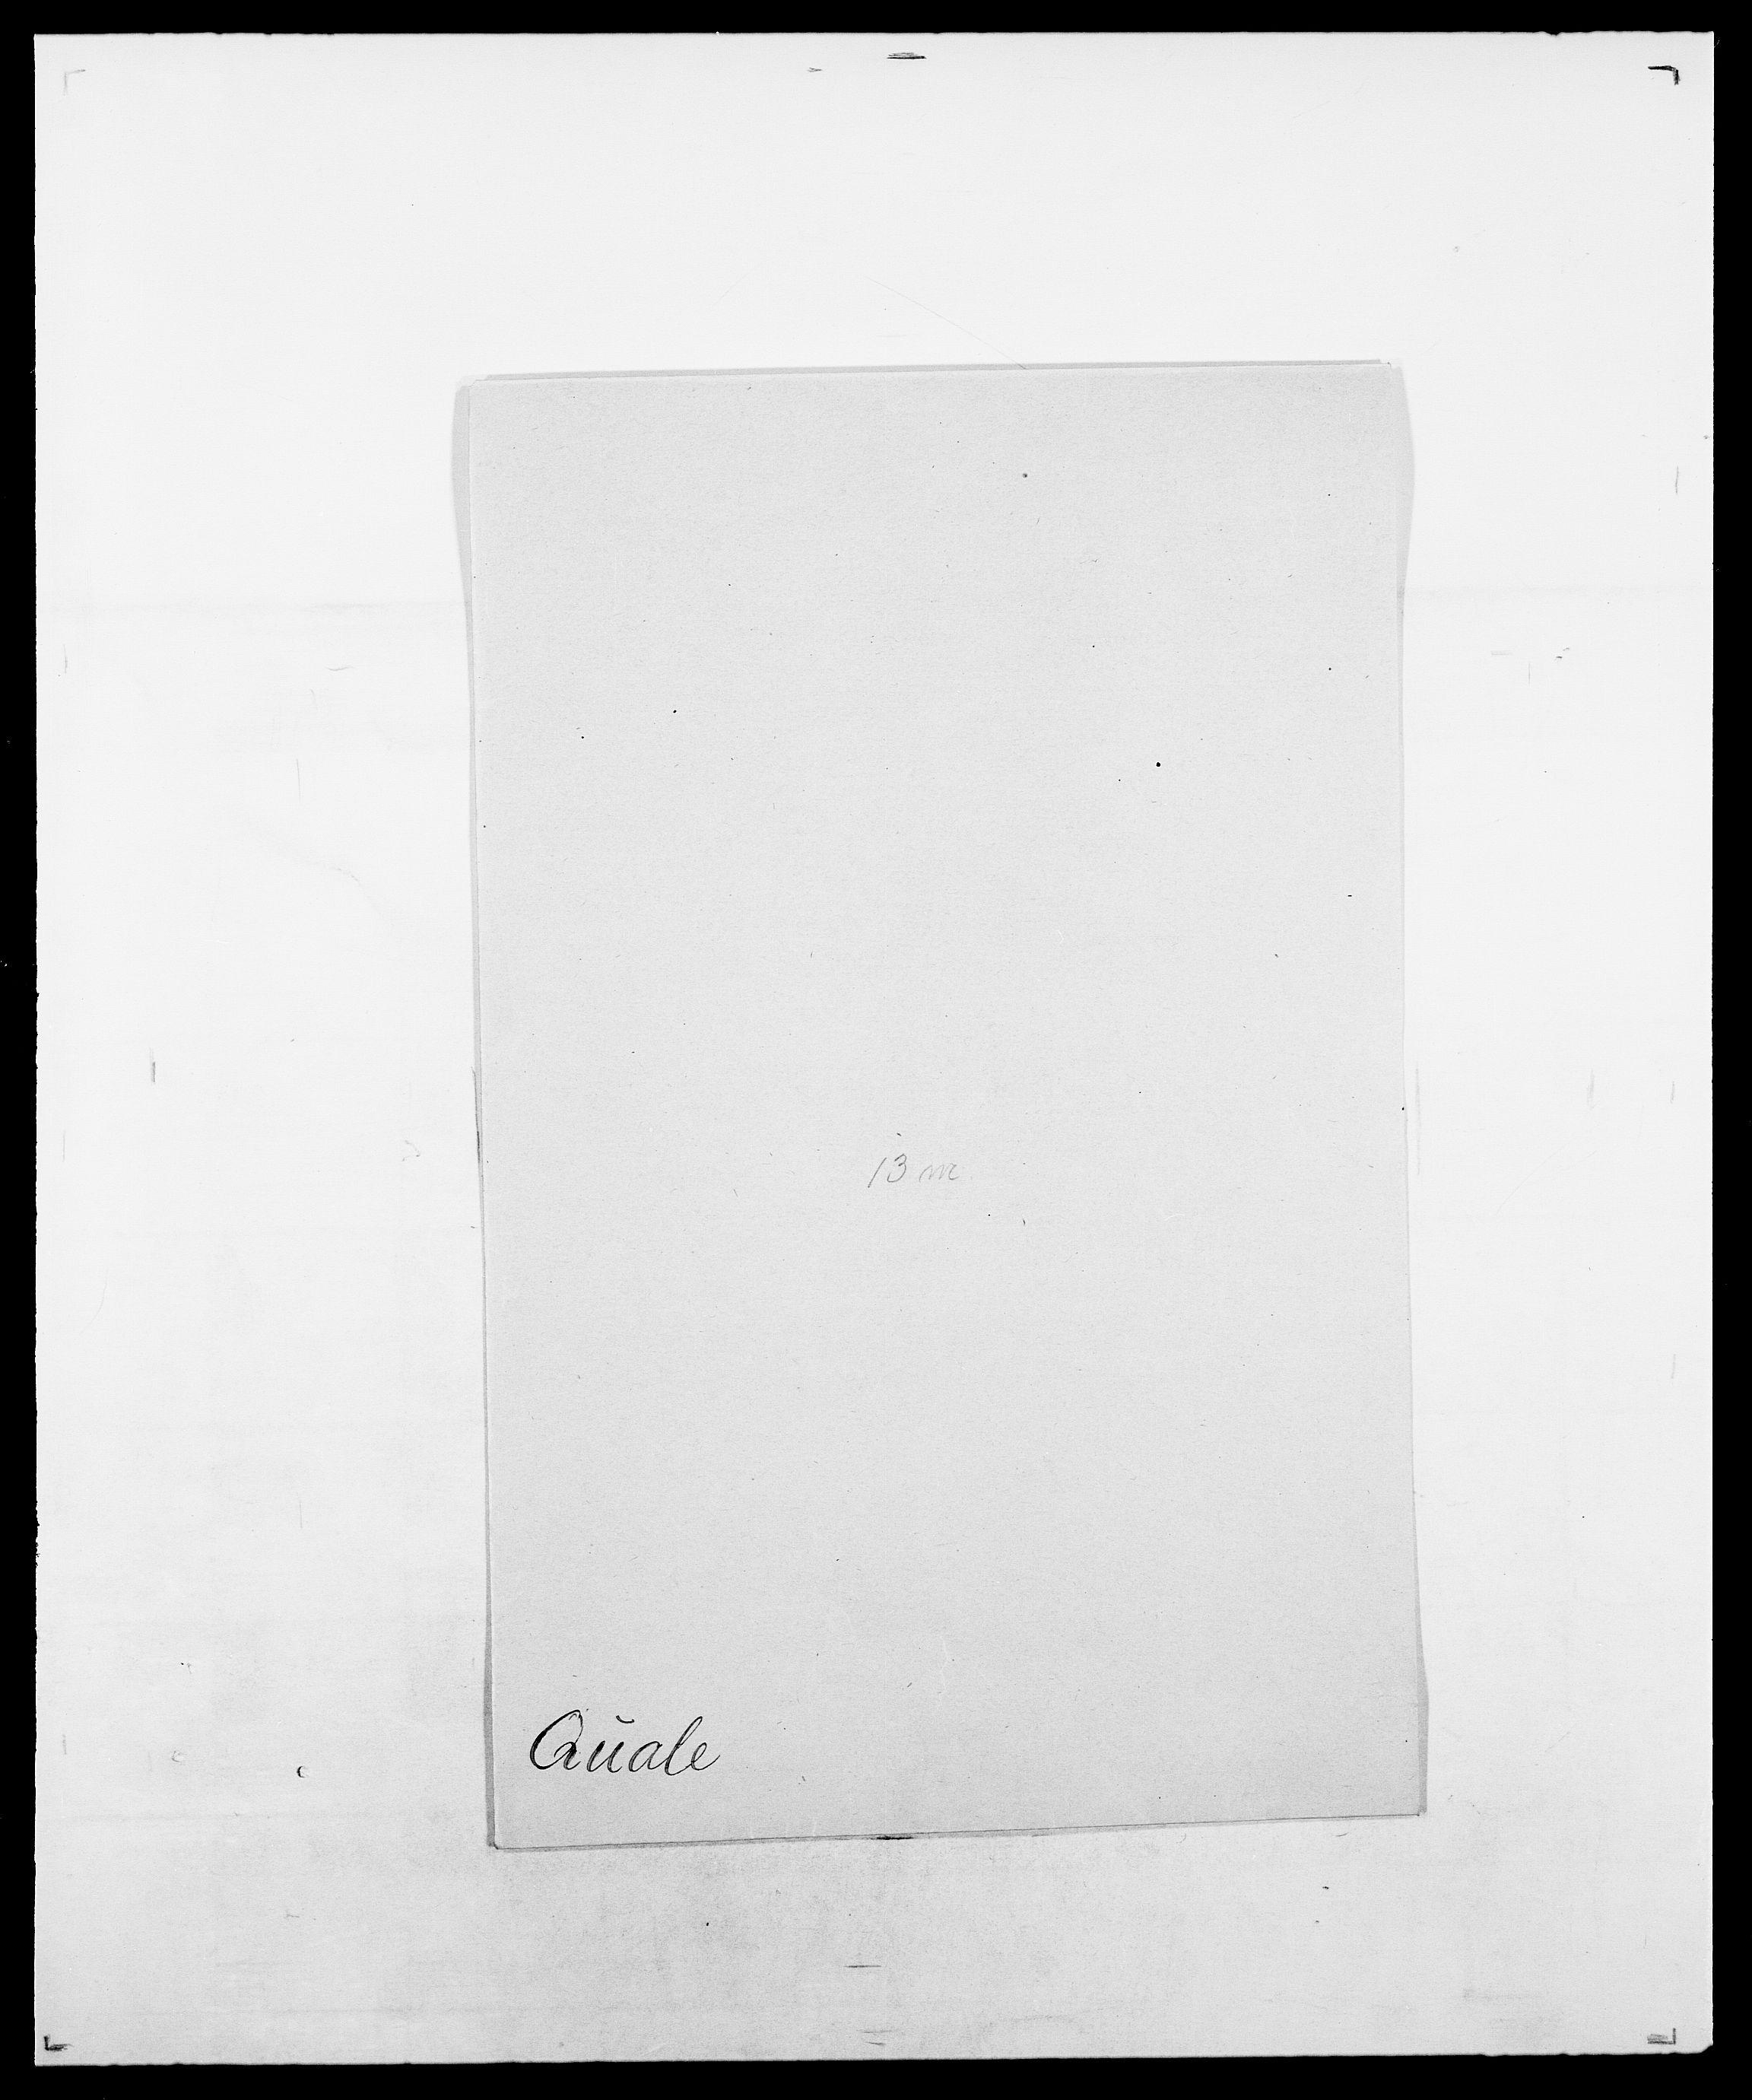 SAO, Delgobe, Charles Antoine - samling, D/Da/L0031: de Place - Raaum, s. 461